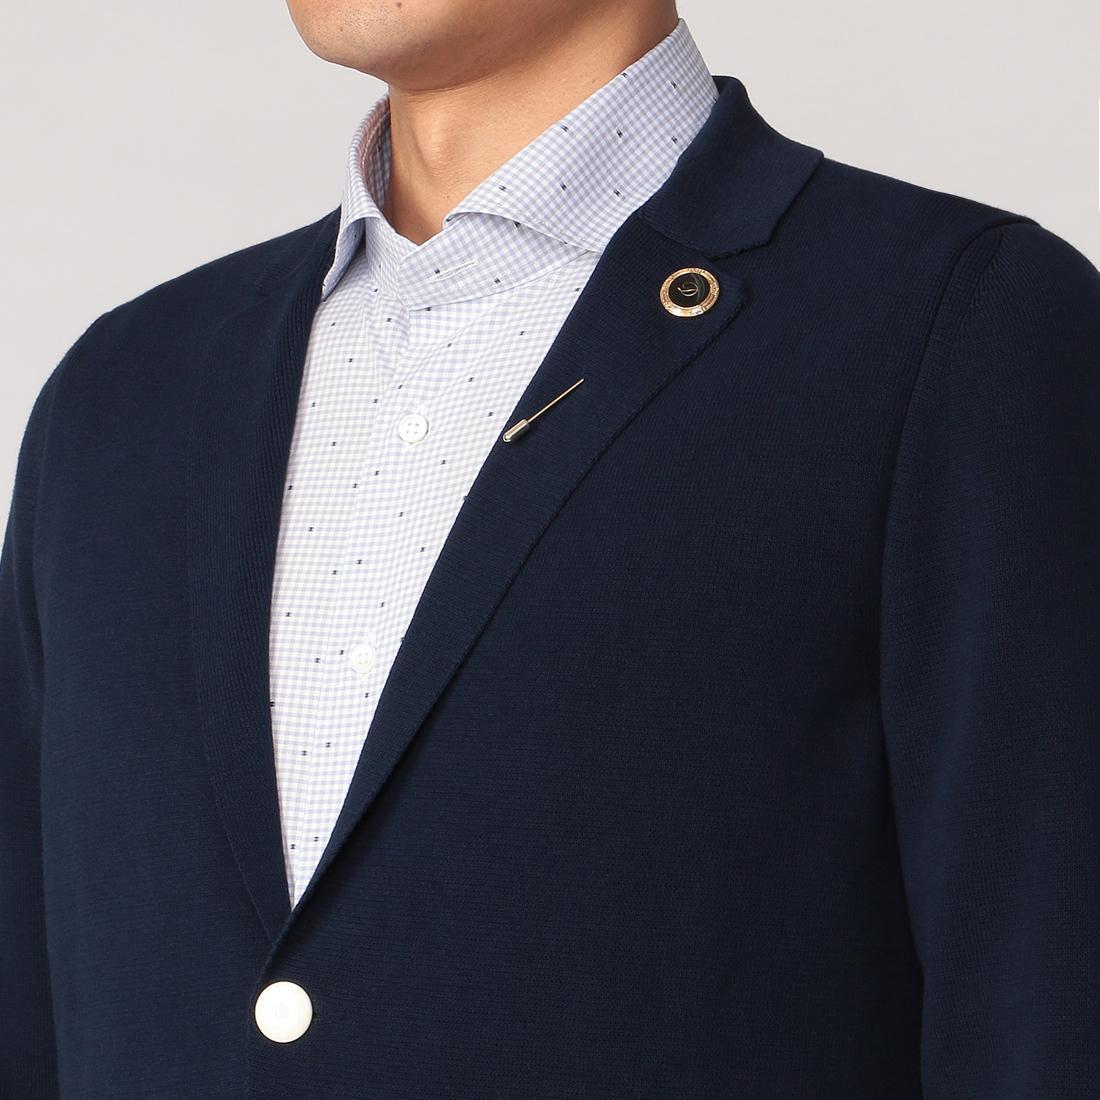 Cotton Cardigan 2007682: Navy